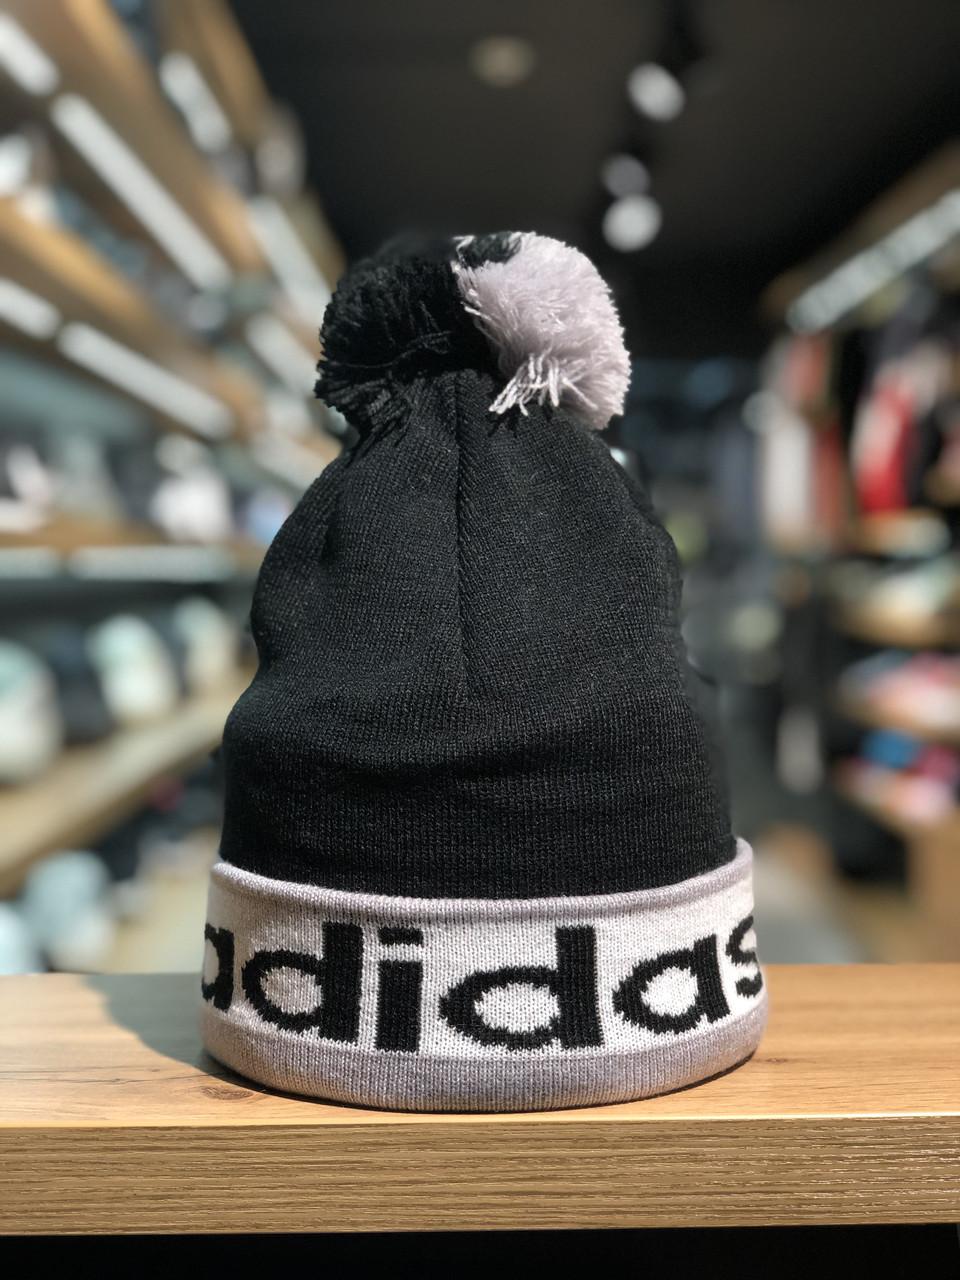 Шапка зимняя Adidas / SPK-1009 (Реплика)